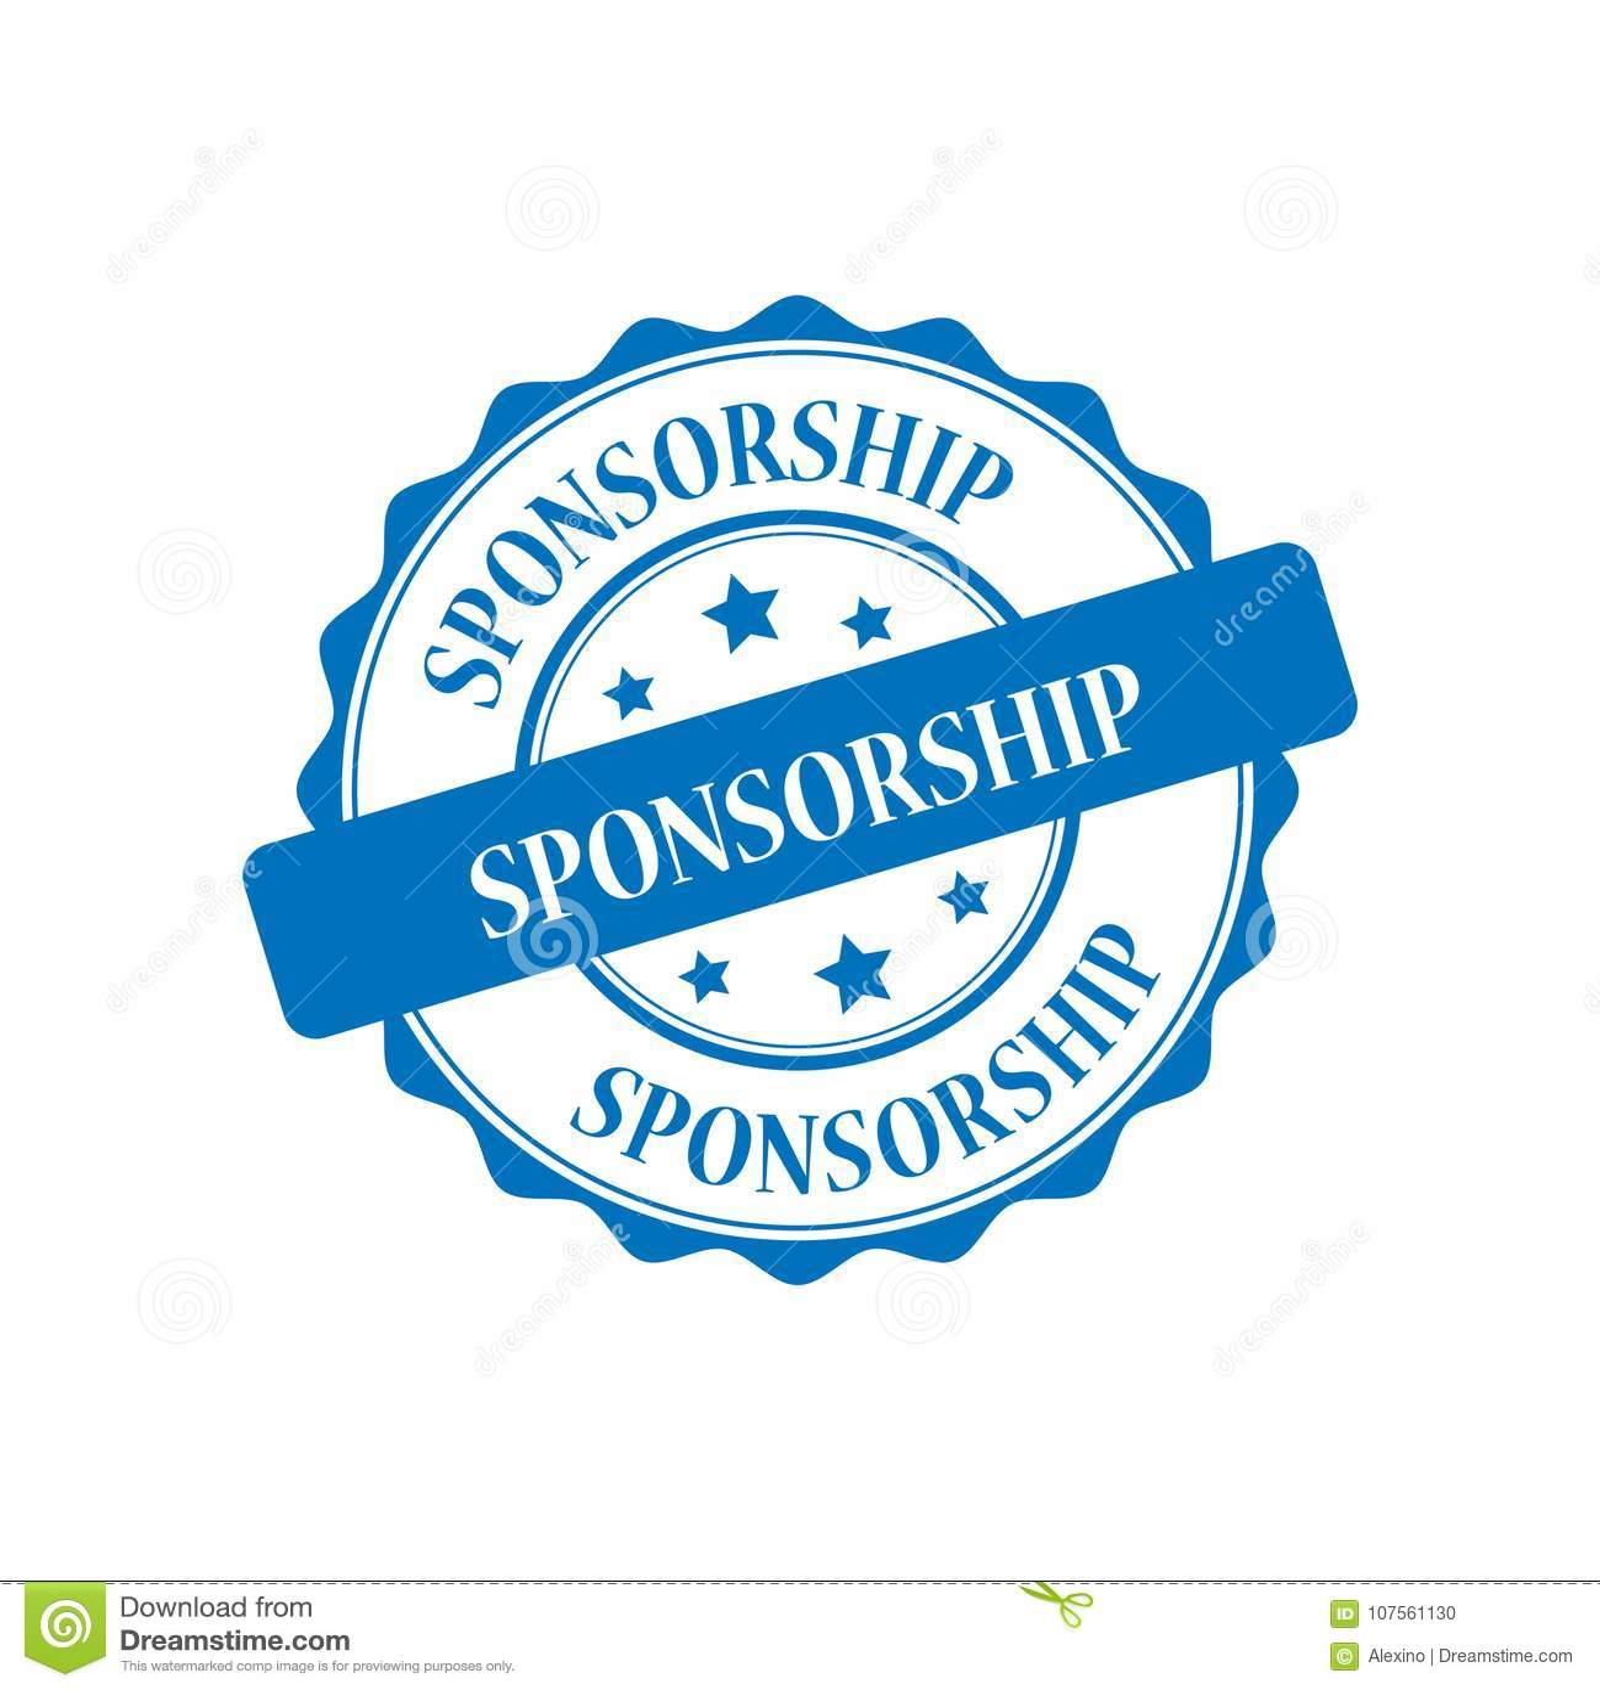 Sponsorship stamp illustration